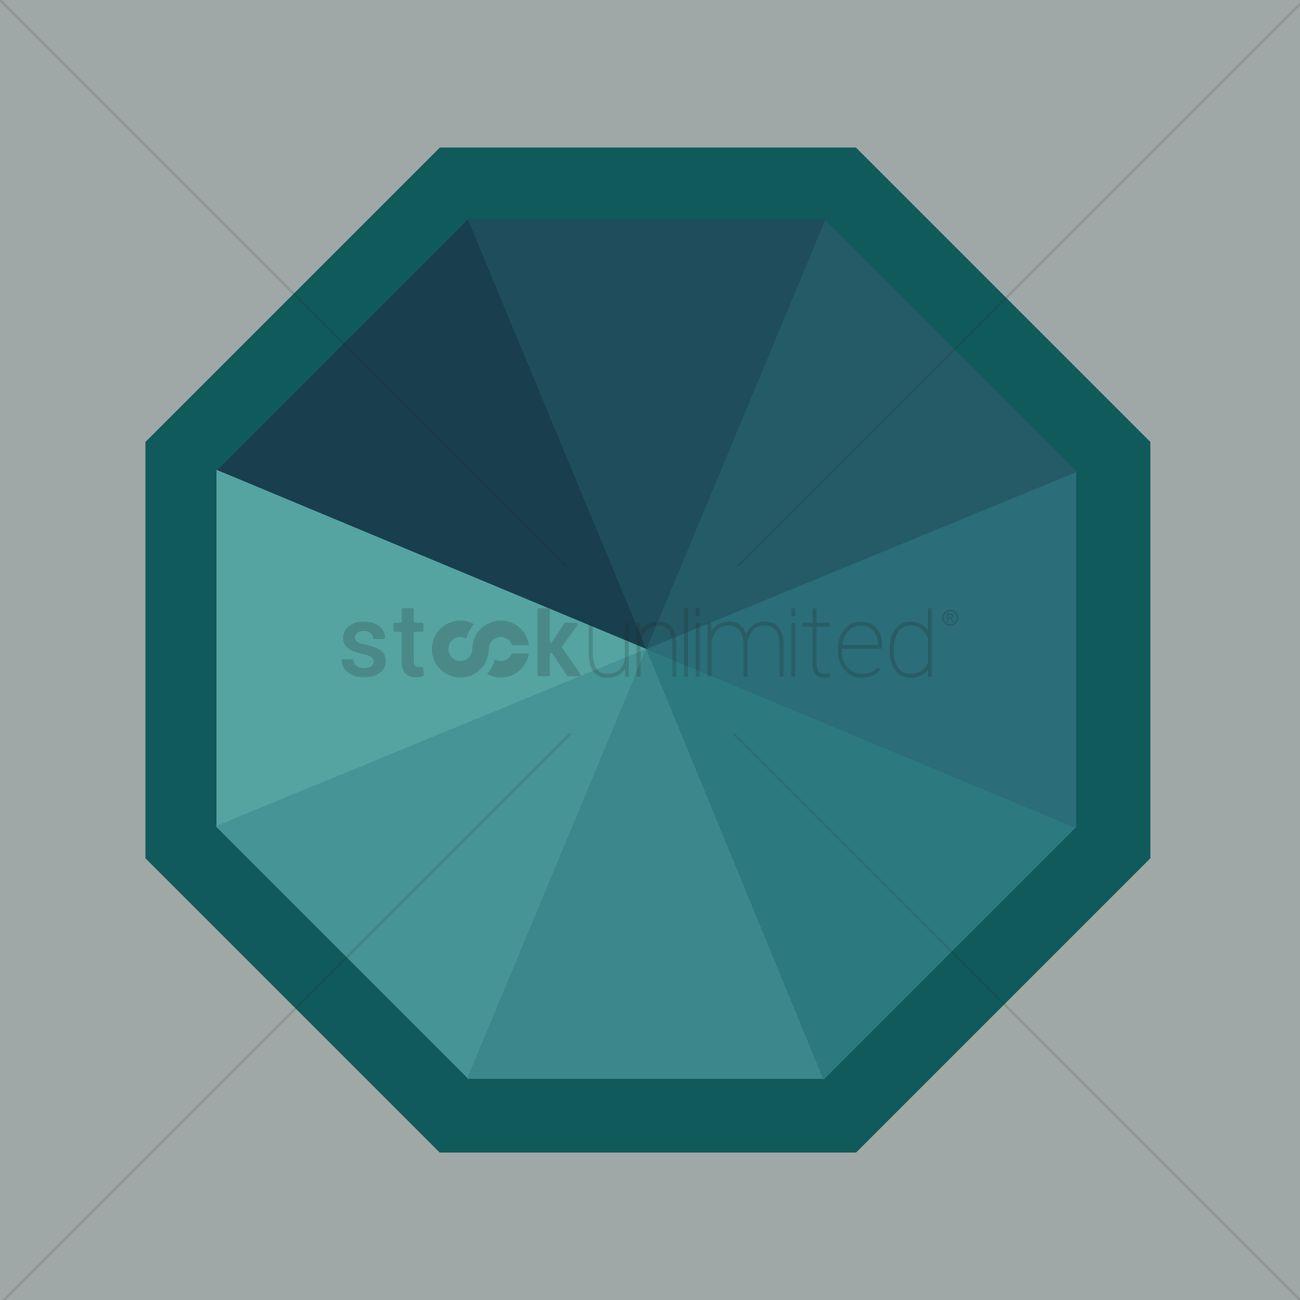 1300x1300 Octagon Vector Image